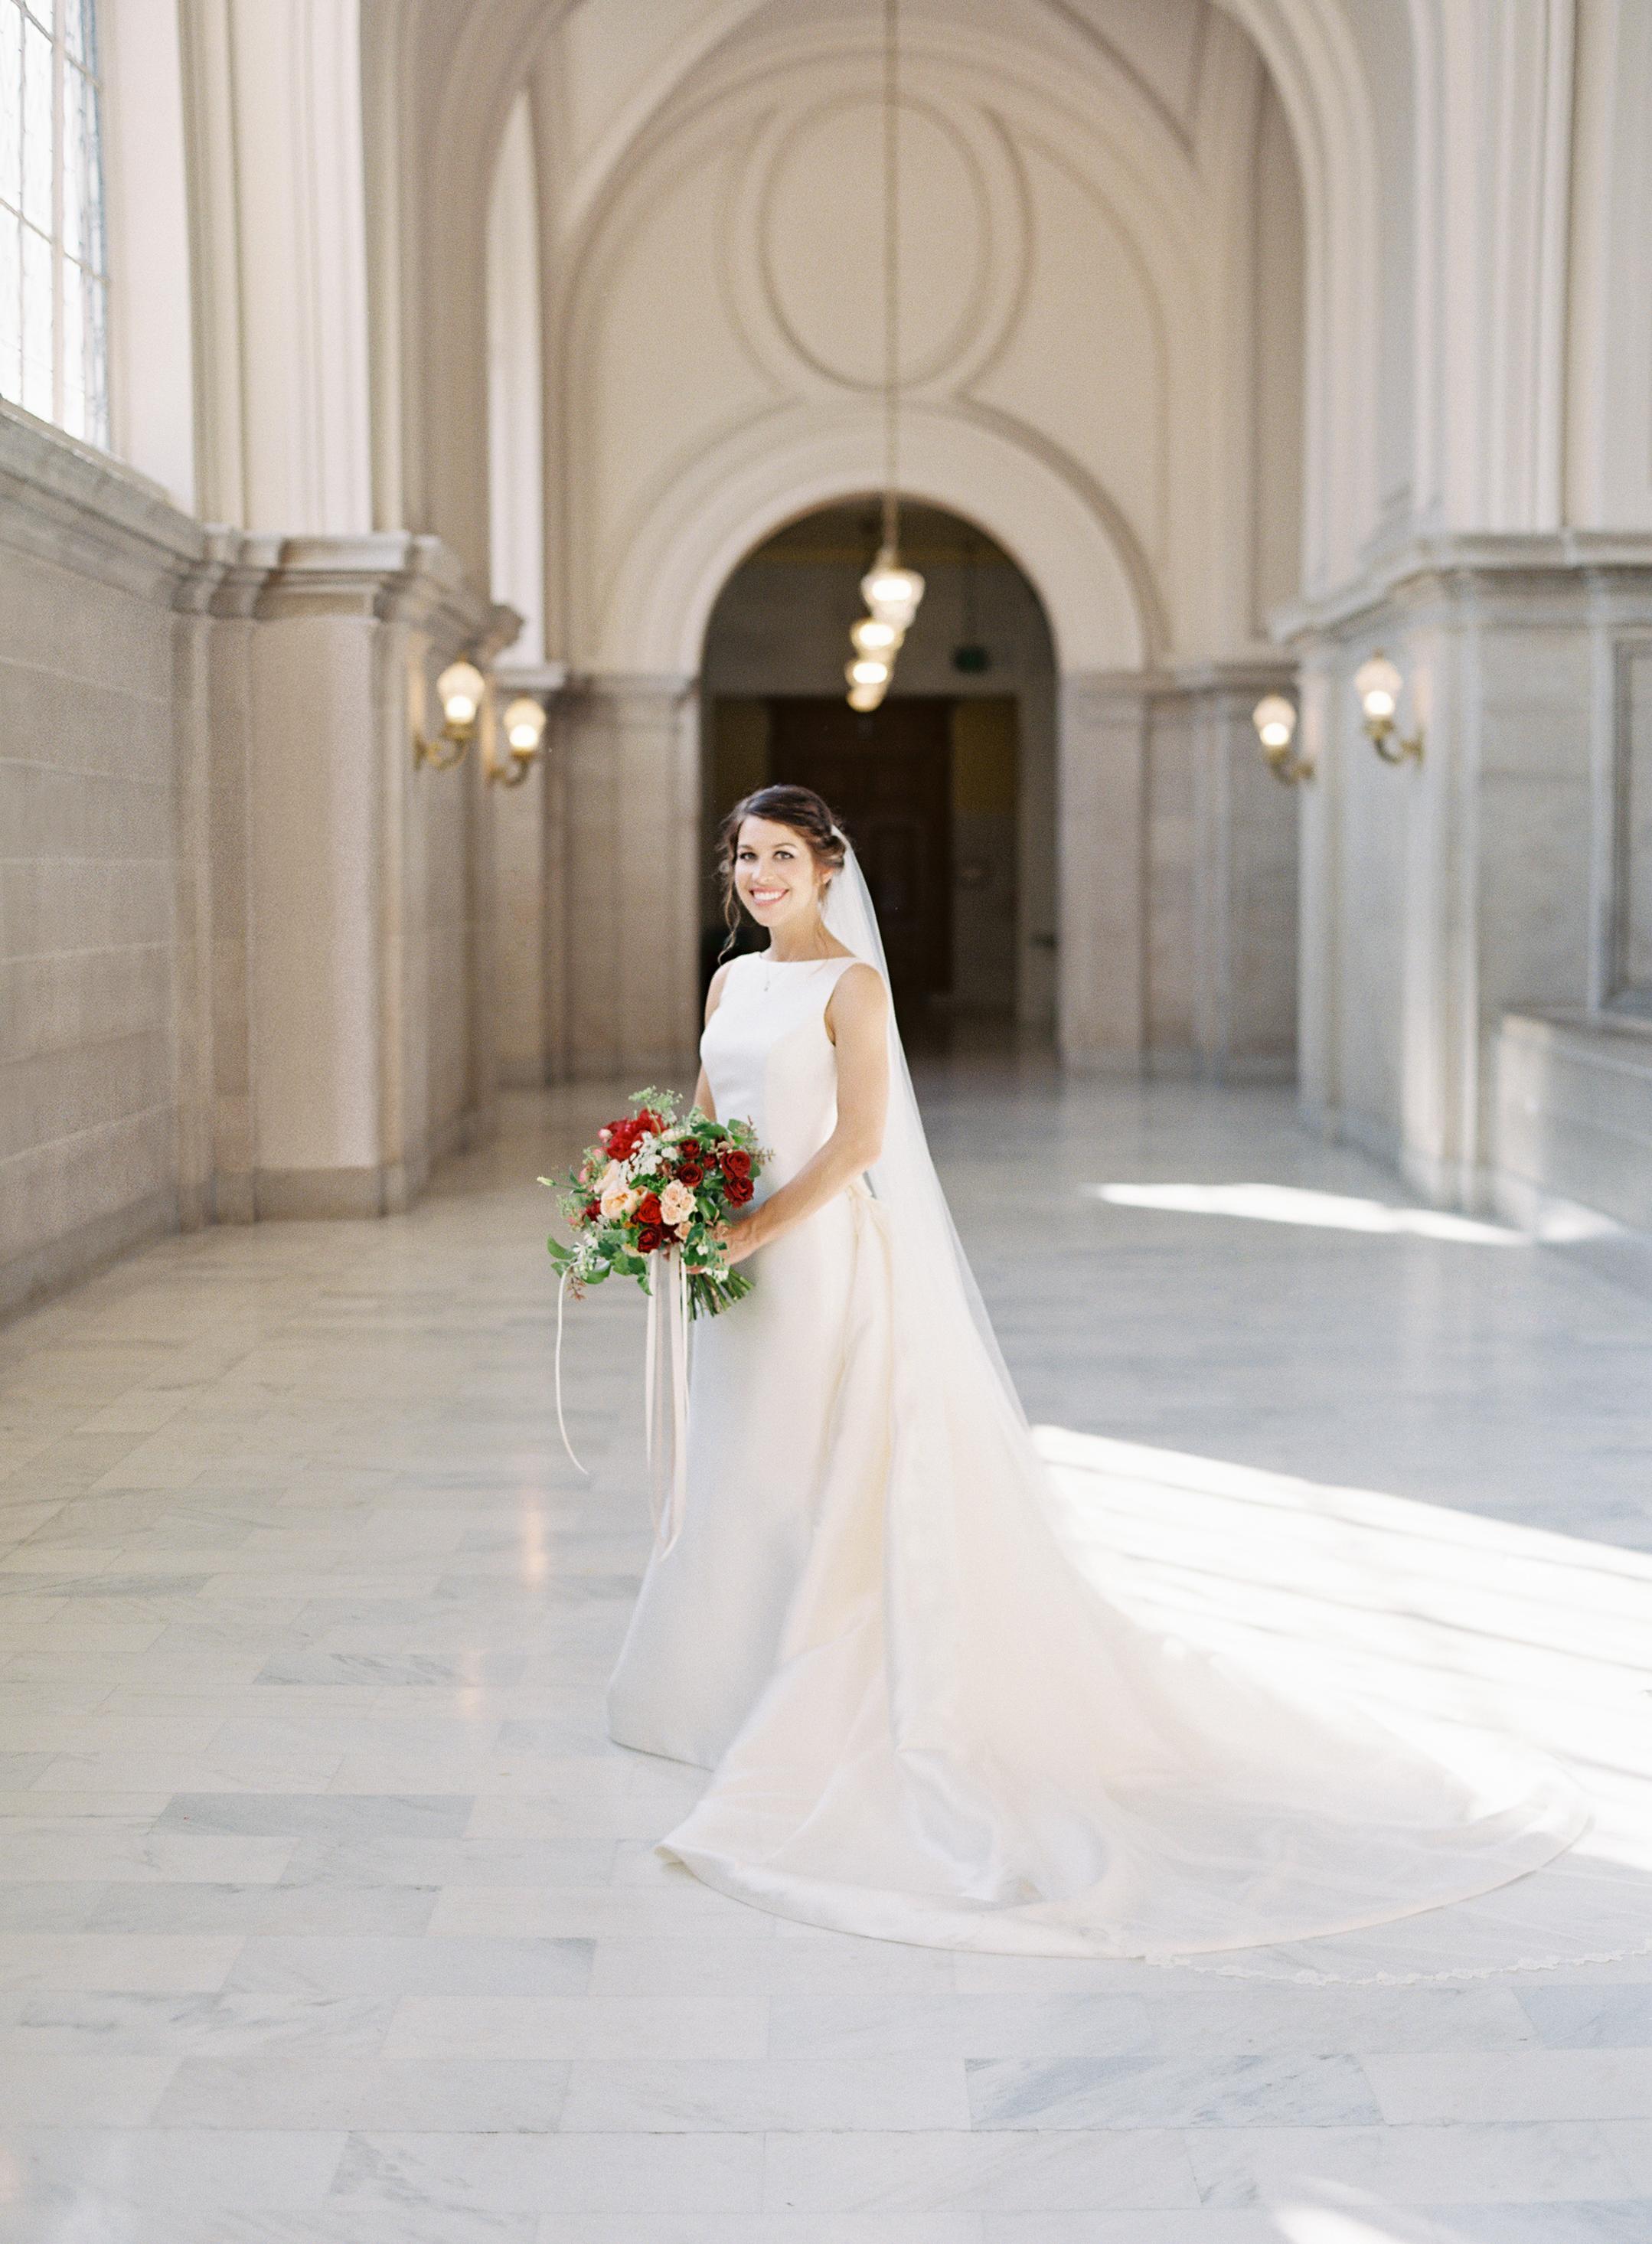 Meghan Mehan Photography - California Wedding Photographer | San Francisco City Hall Wedding 047.jpg